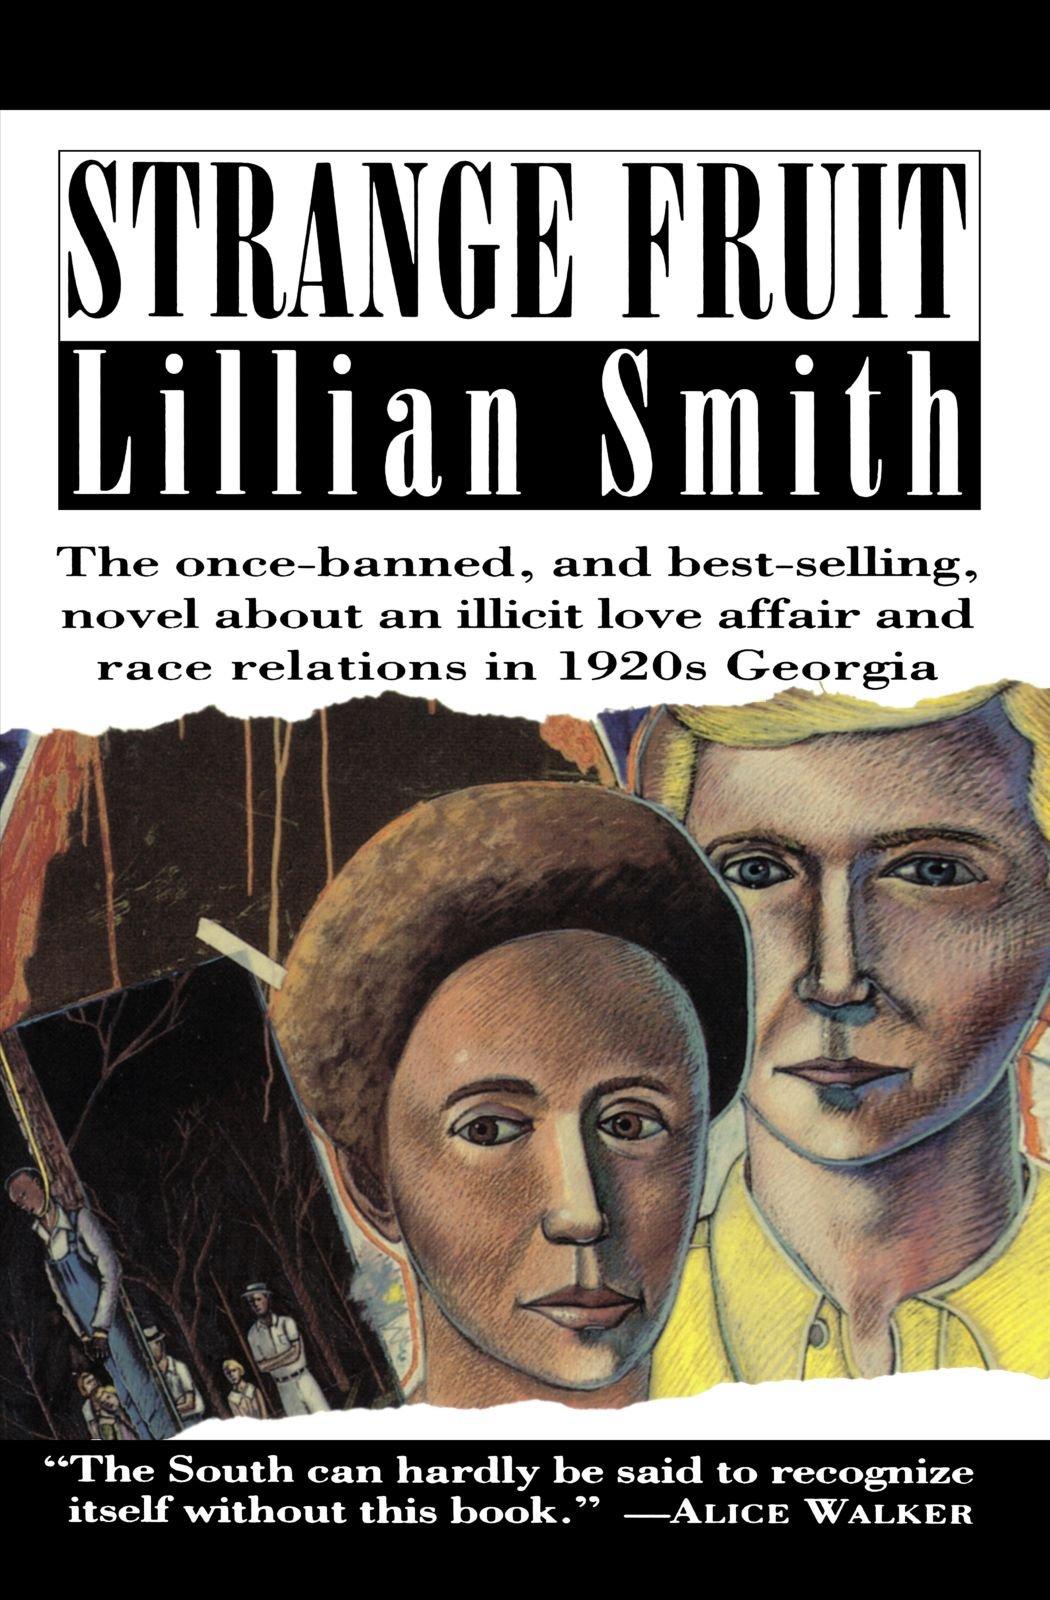 strange fruit lillian smith free pdf